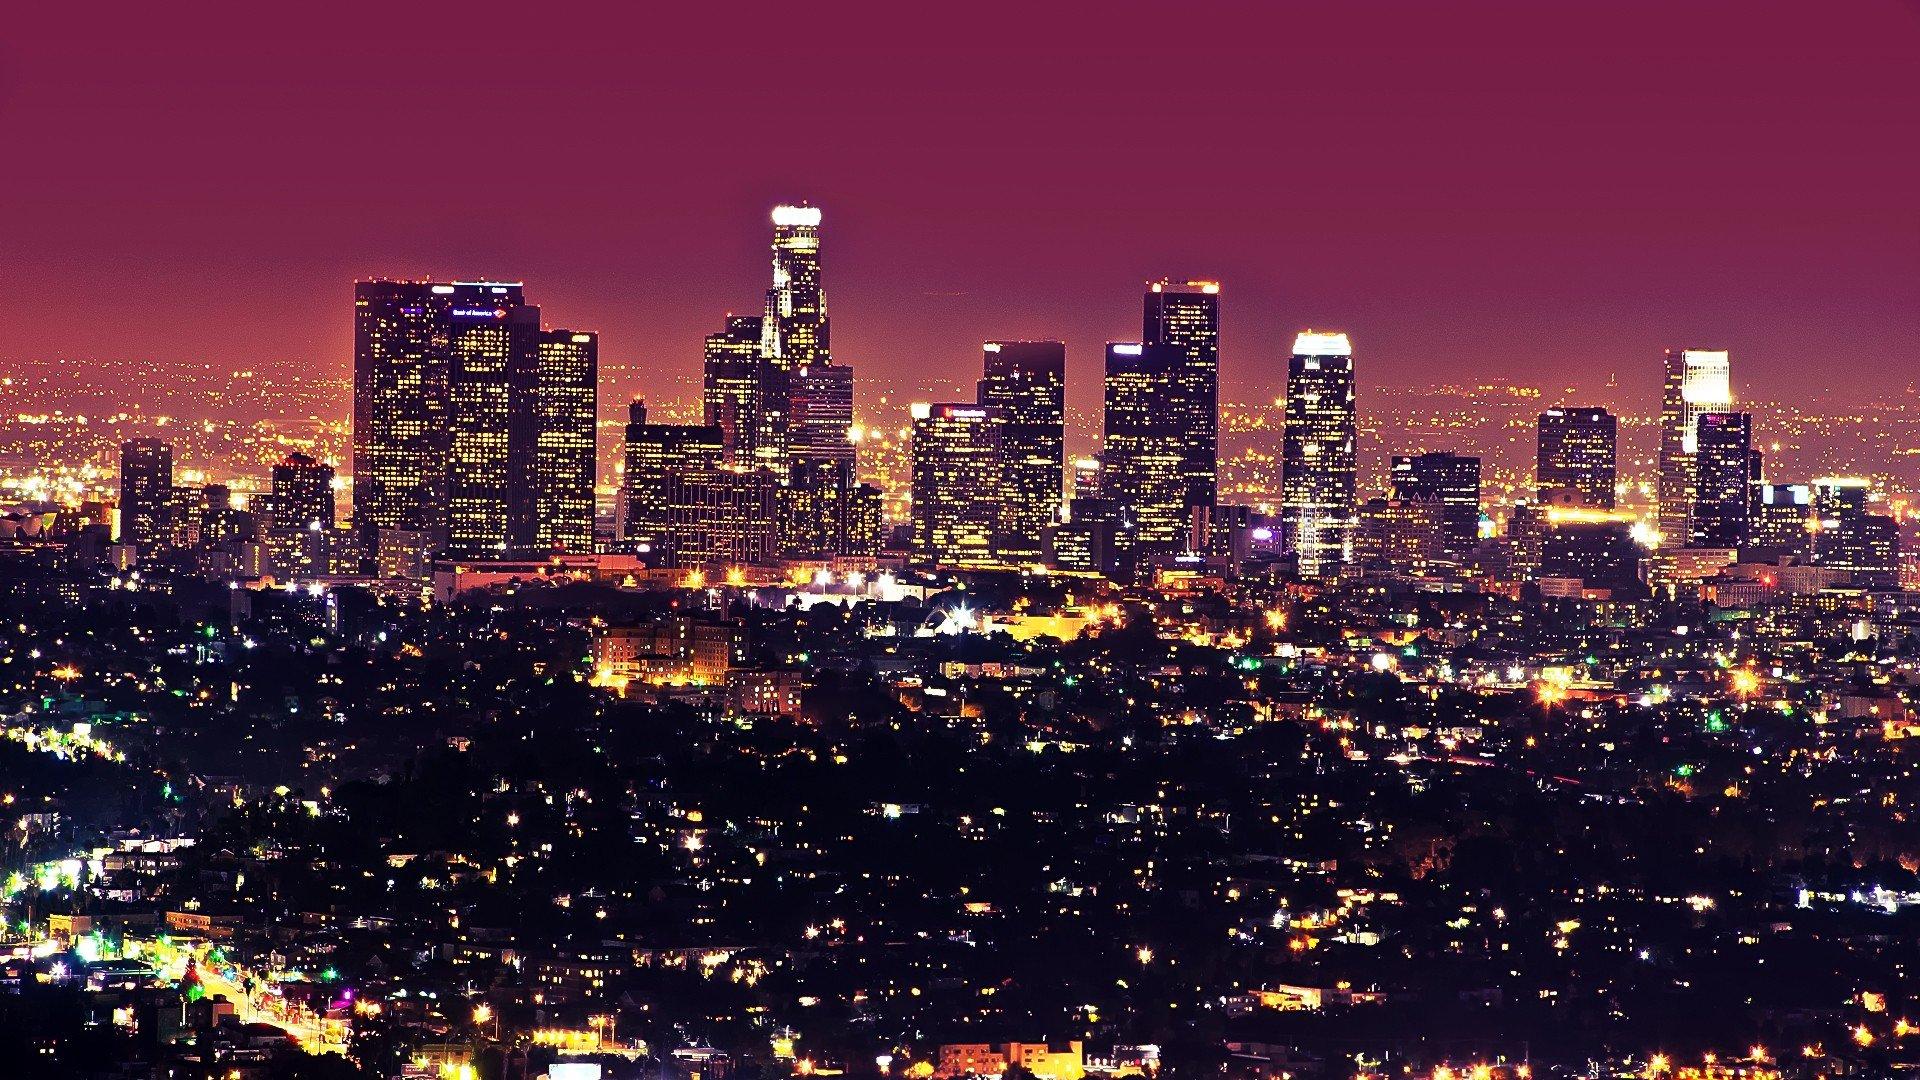 Los Angeles City Wallpaper hd Beautiful Los Angeles City at 1920x1080